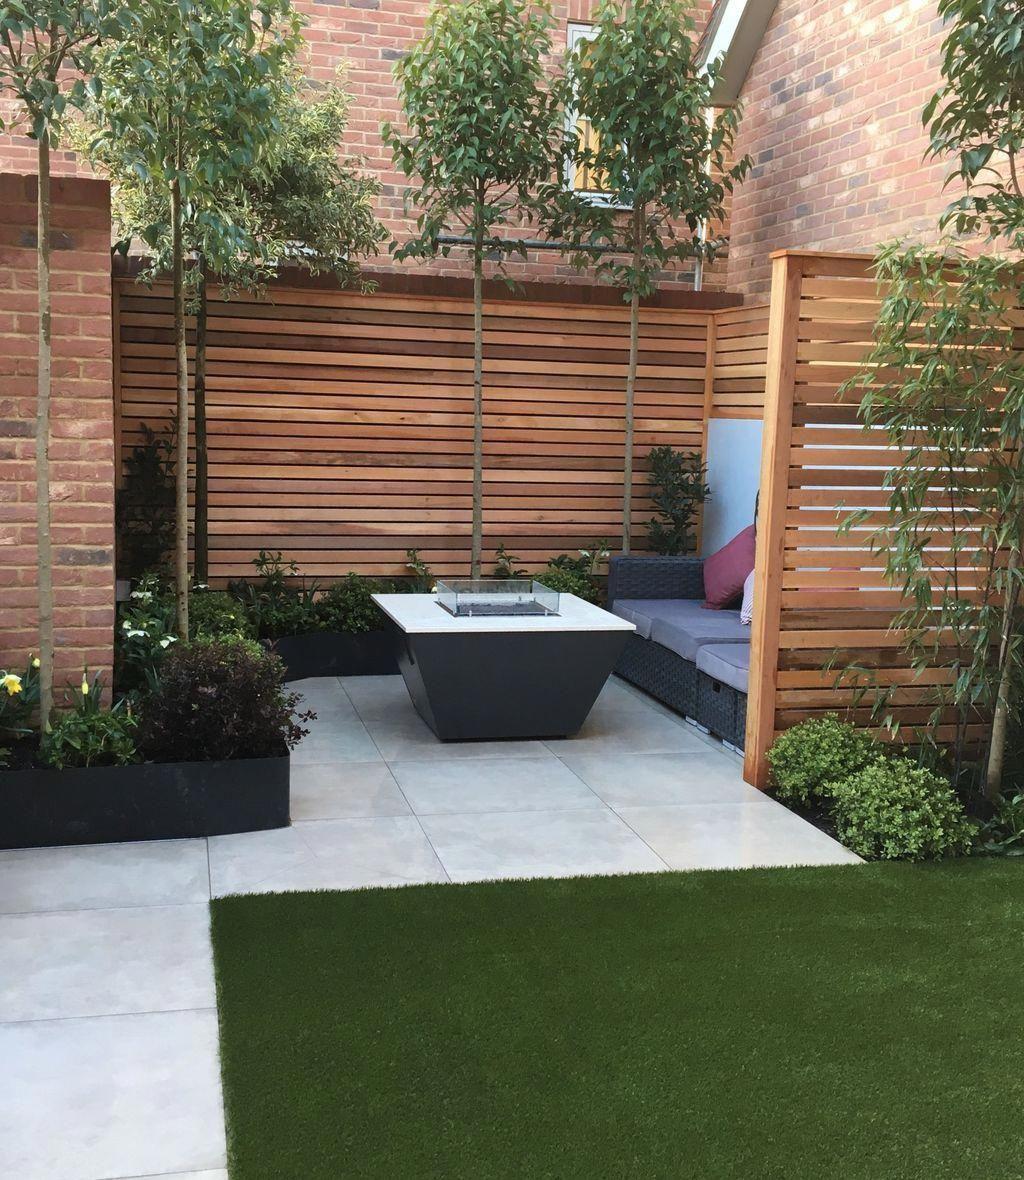 Landscape Design Programs Free Download Patio Garden Design Outdoor Landscape Design Outdoor Patio Designs